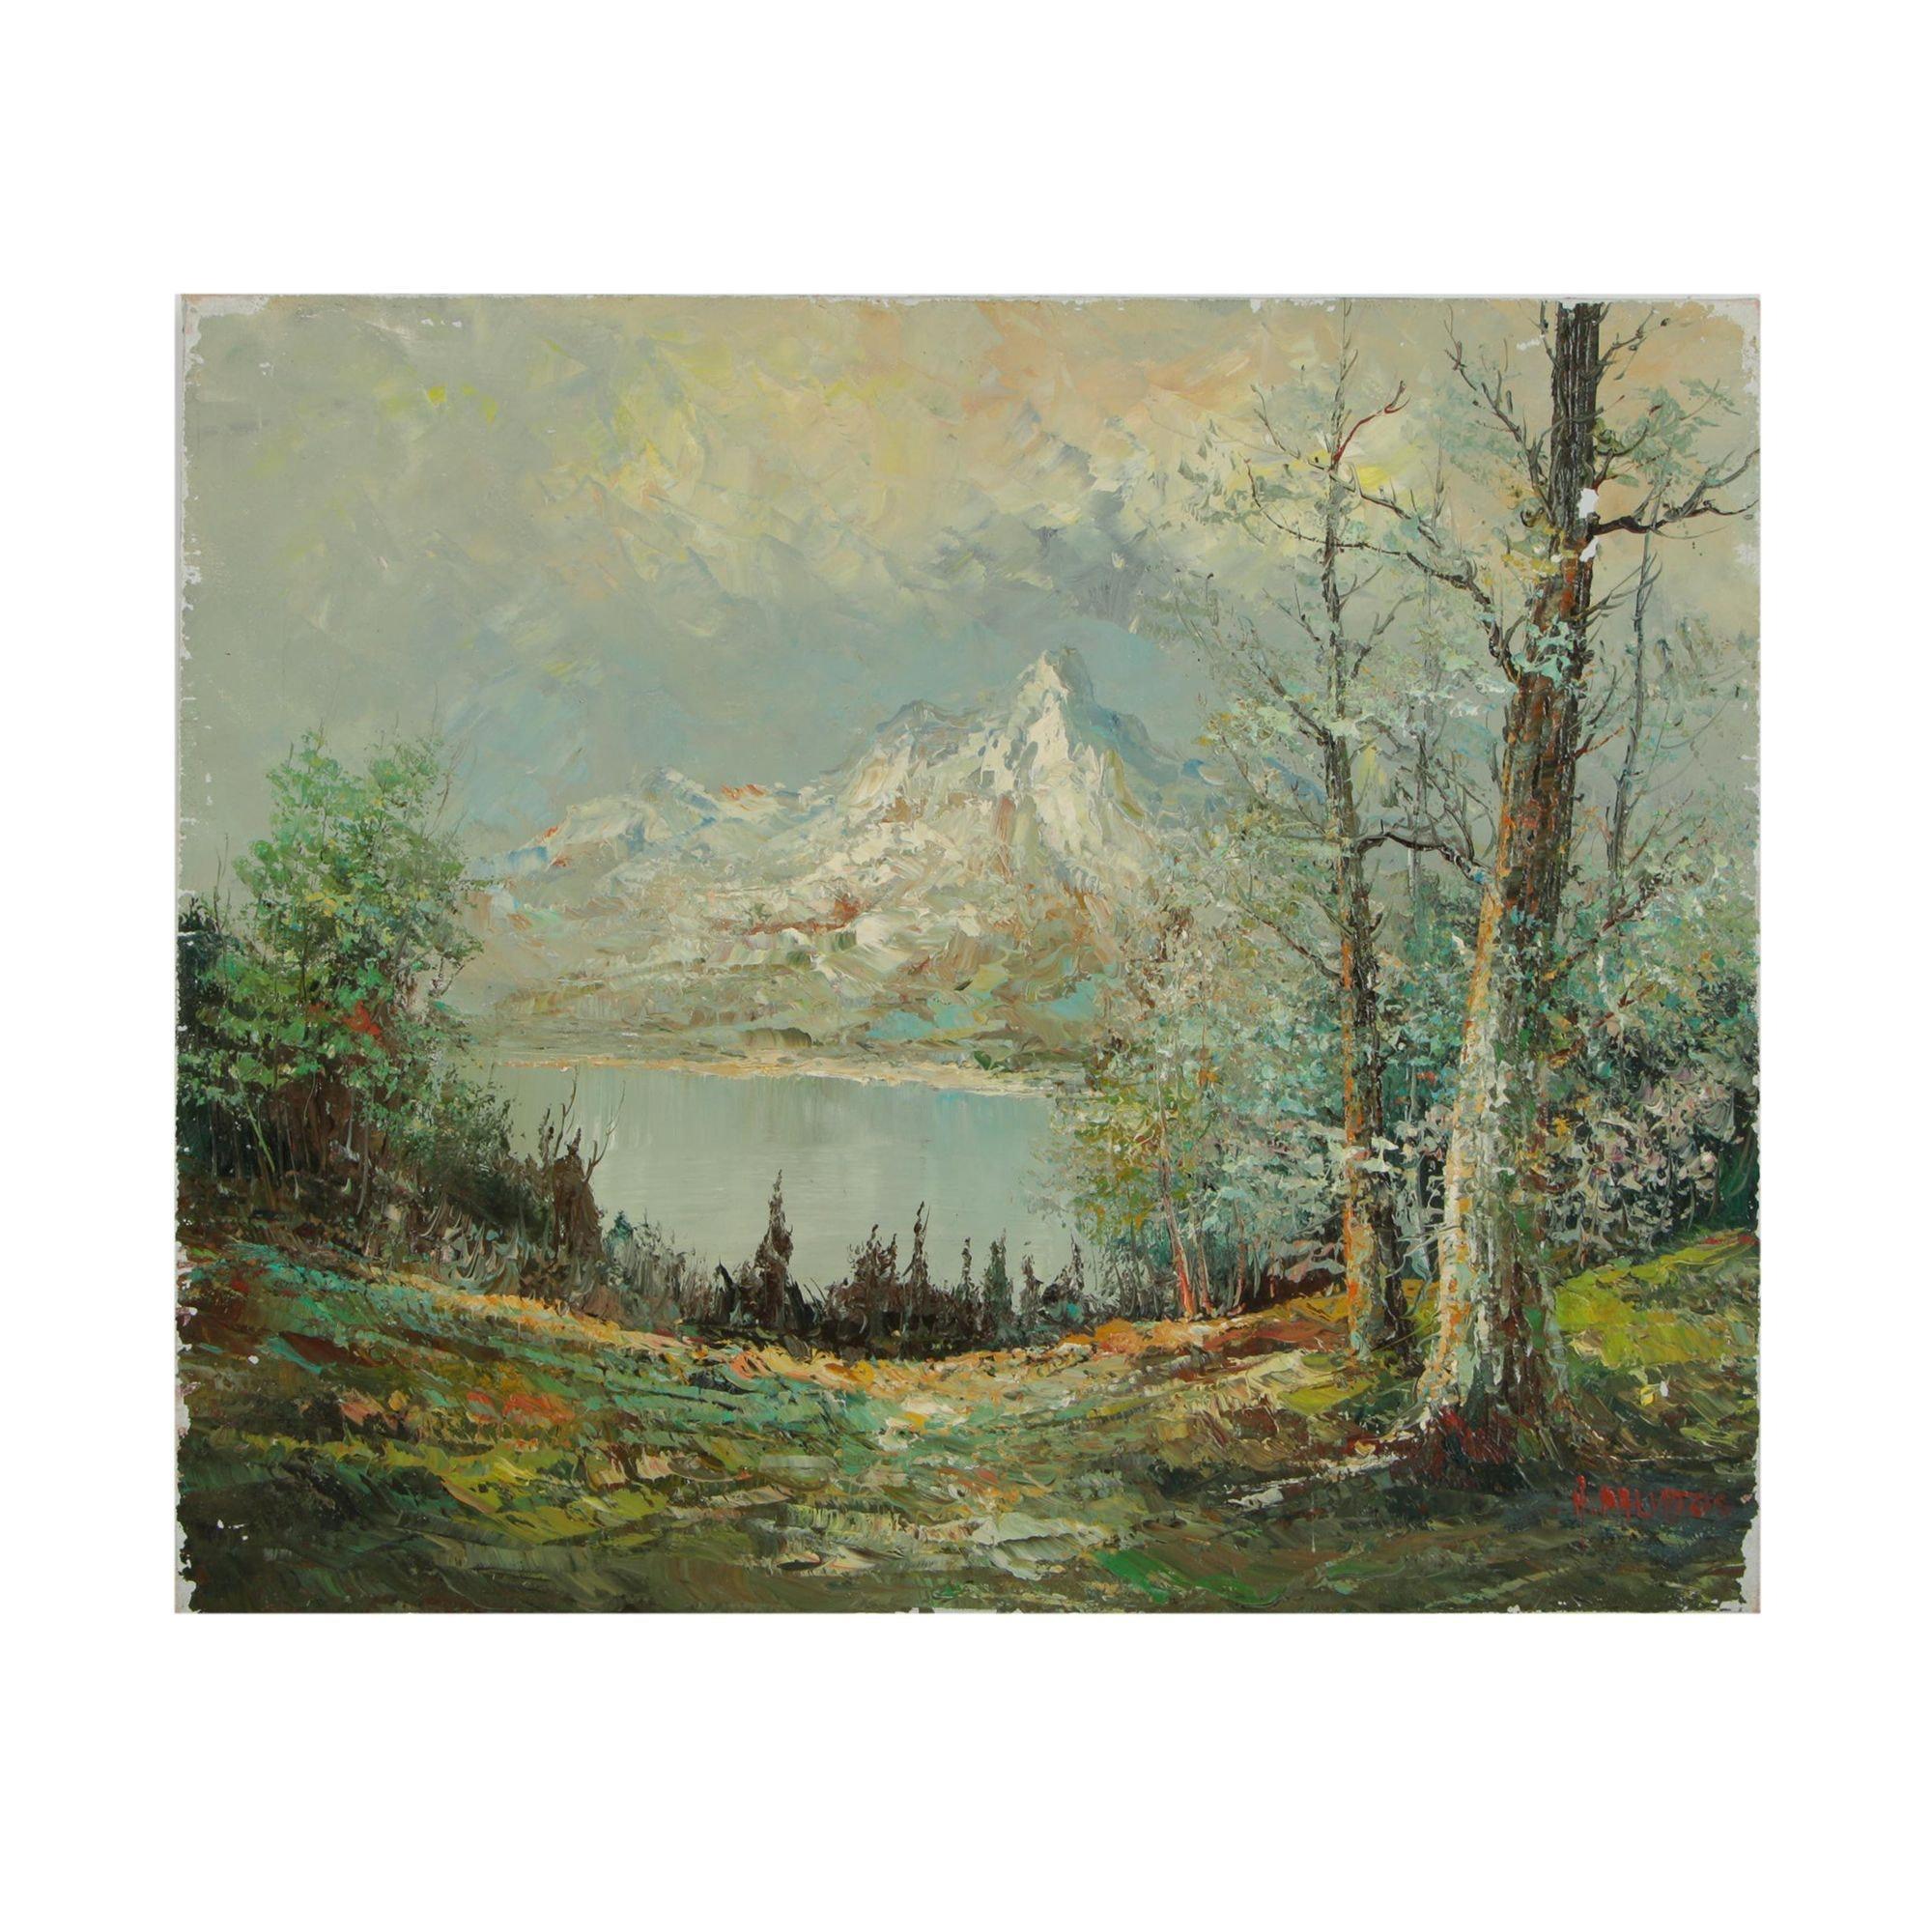 Twentieth Century Landscape Oil Painting